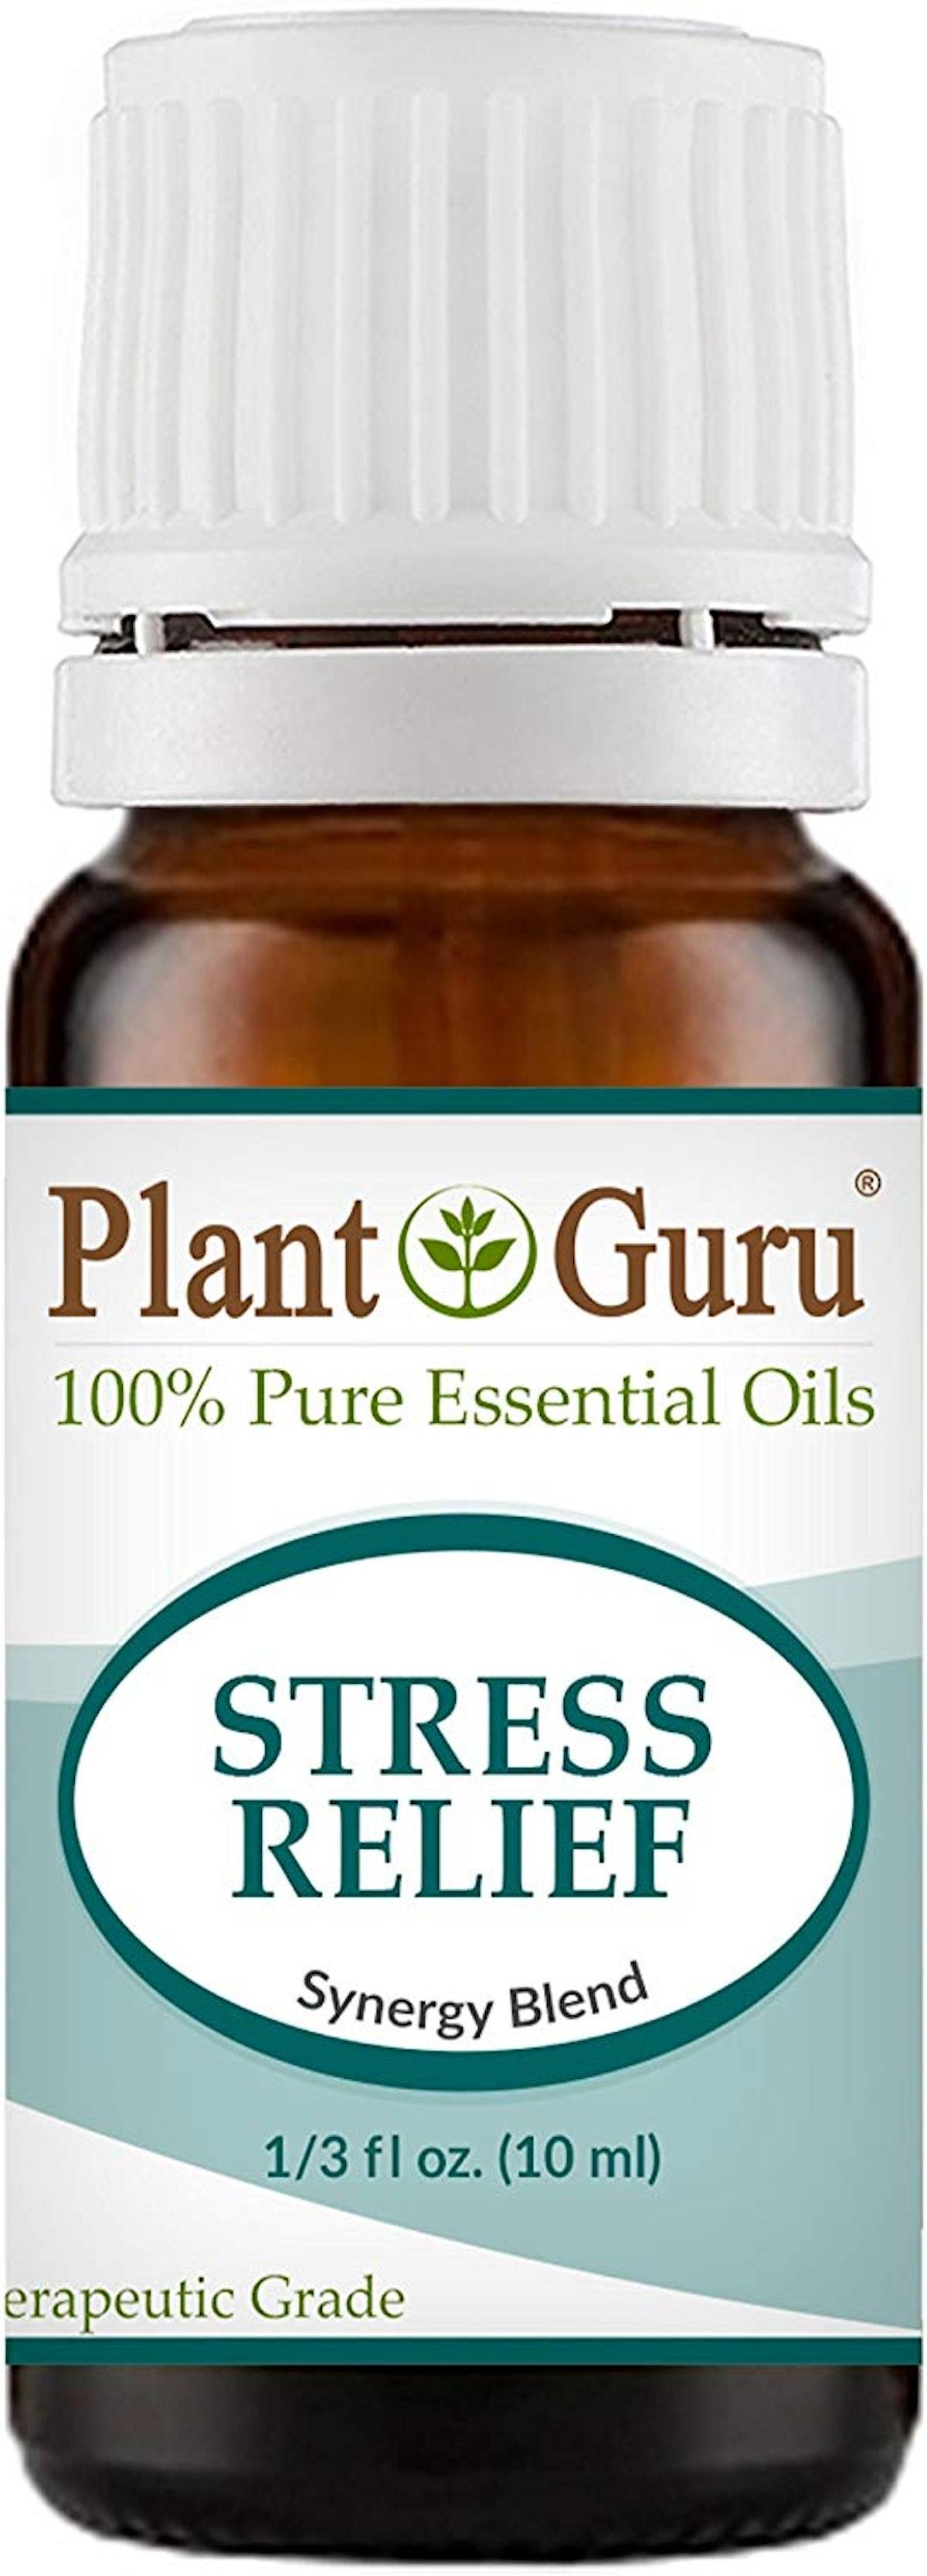 Plant Guru Stress Relief Essential Oil